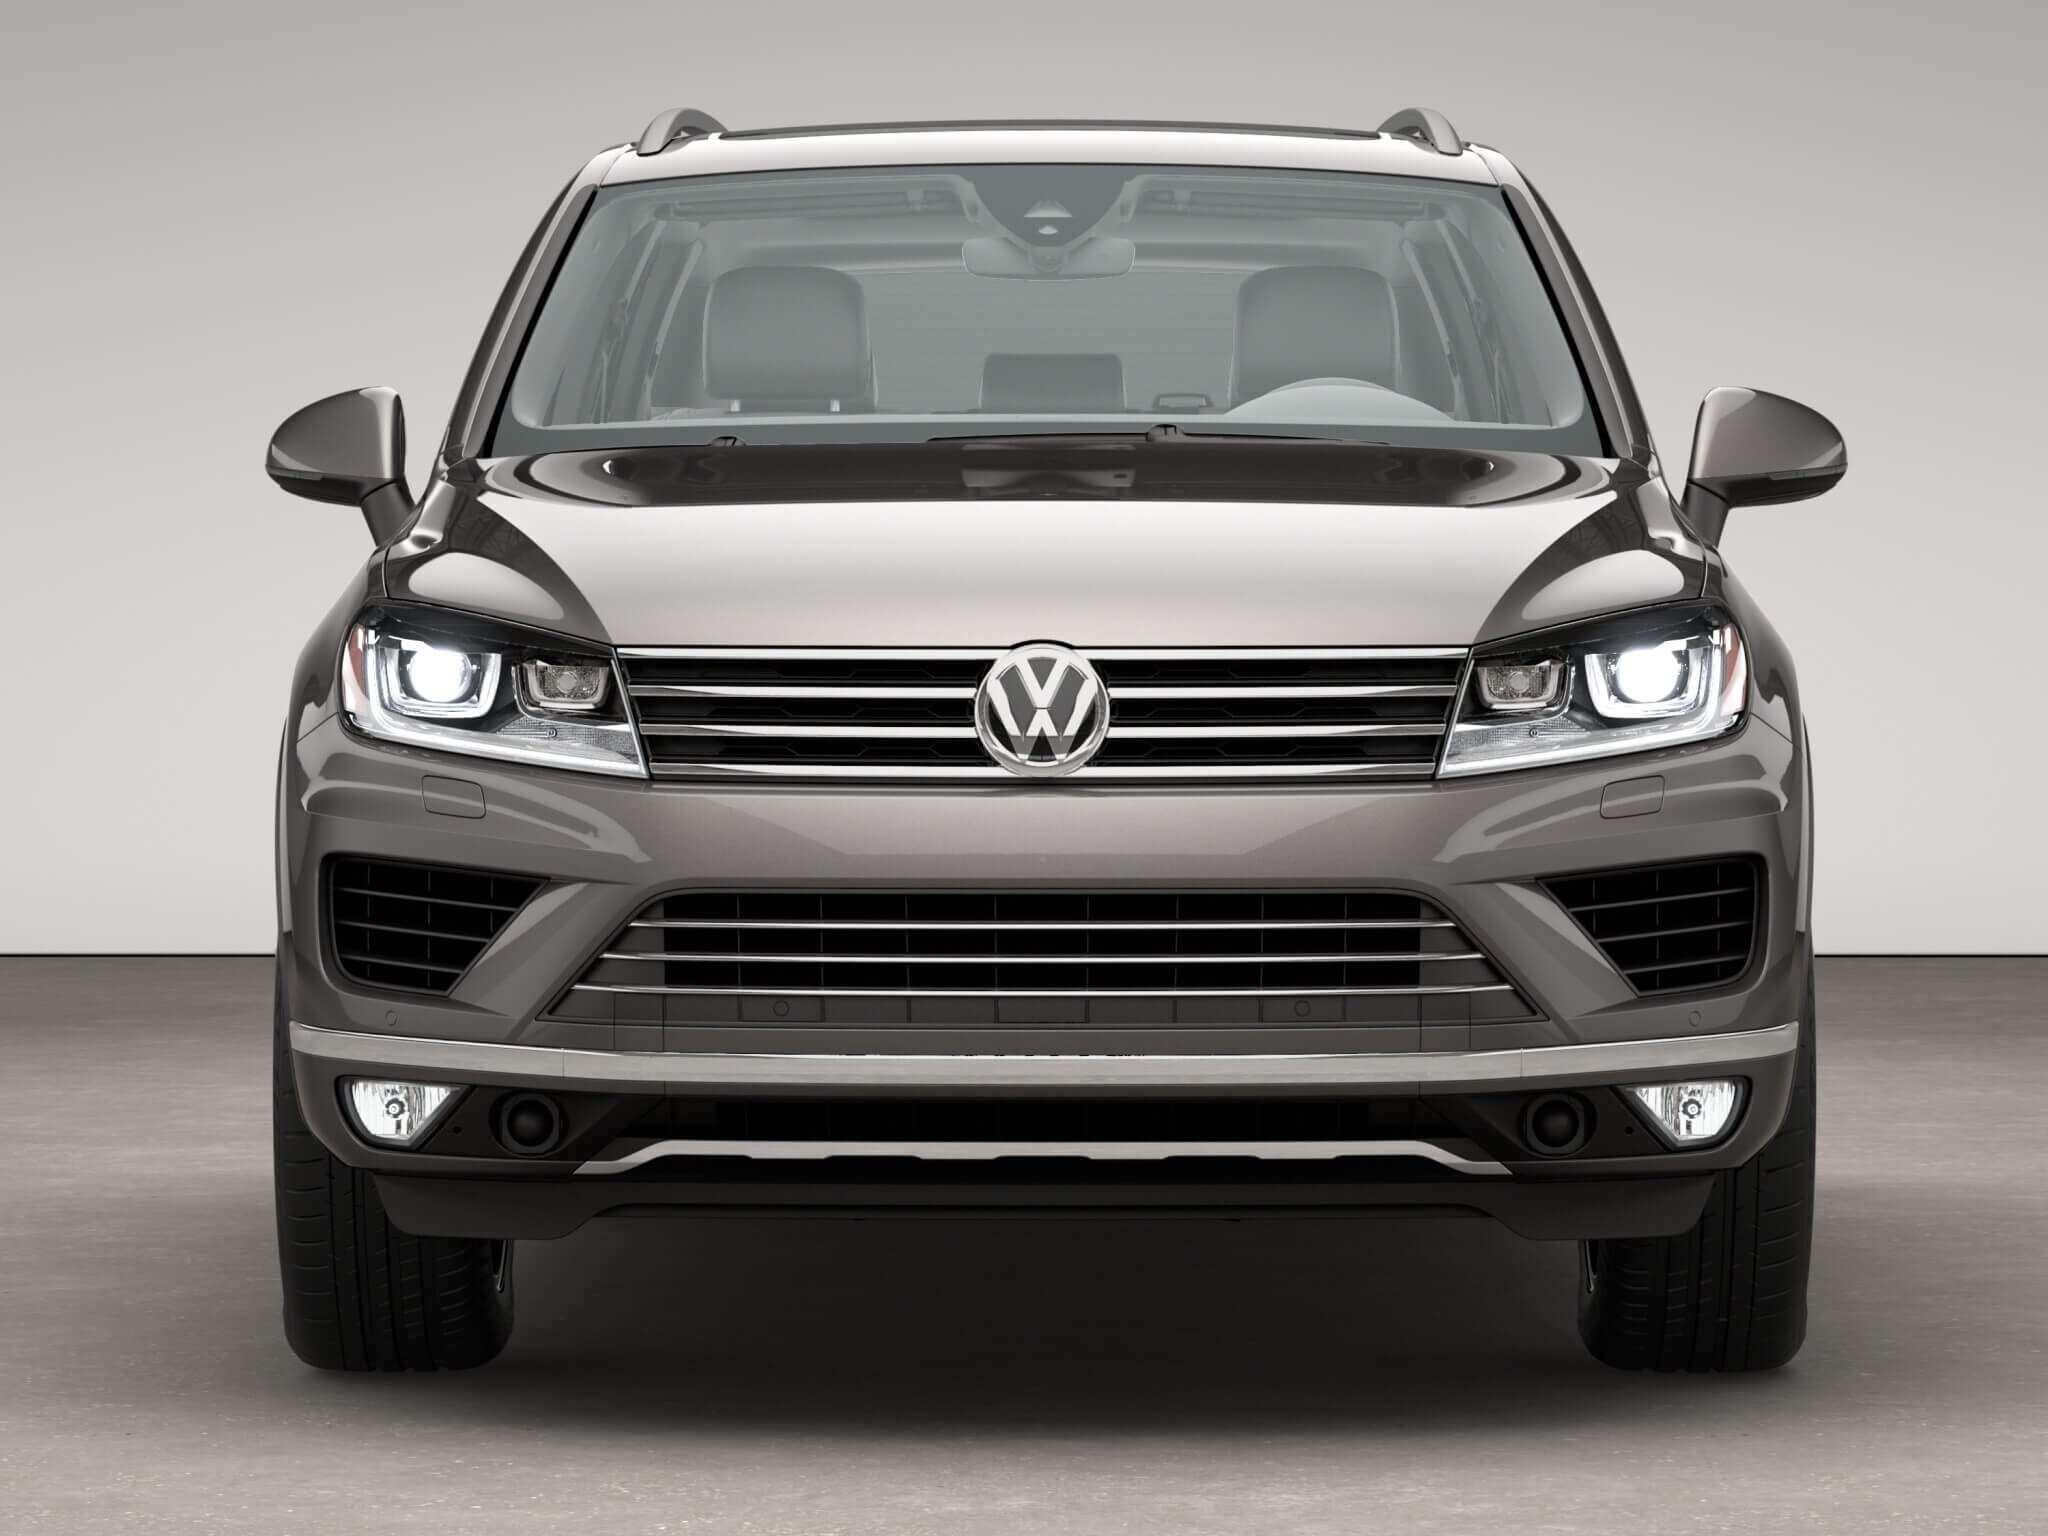 94 New Touareg VW 2020 Research New by Touareg VW 2020